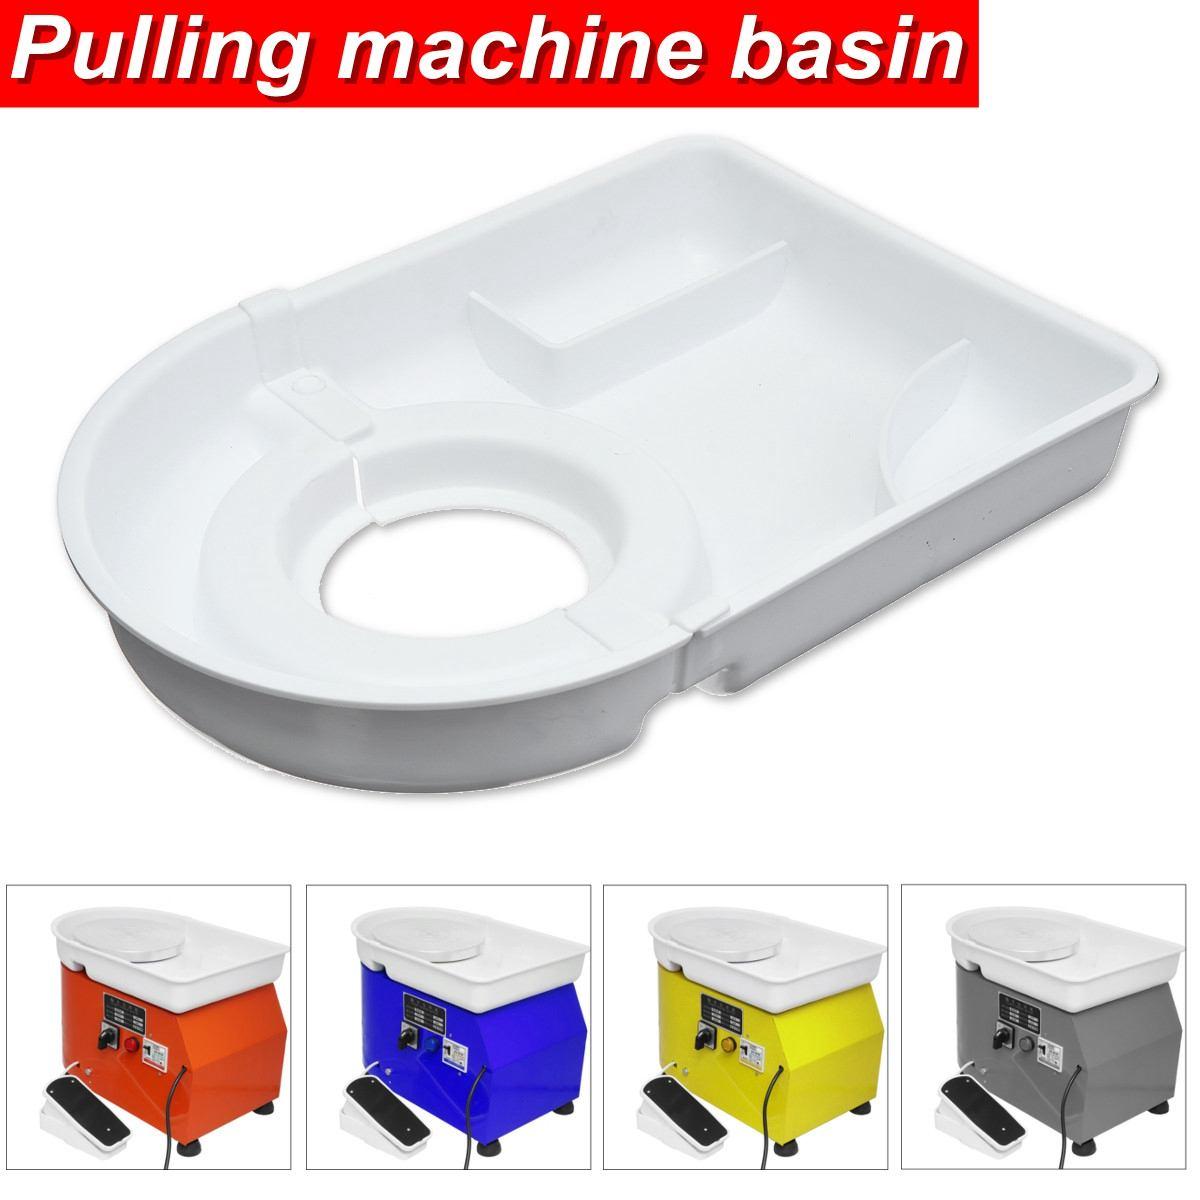 Pottery Wheel Ceramic Machine Pulling Machine Basin ABS Plastic Work Clay Art Craft Tool Parts Fittings